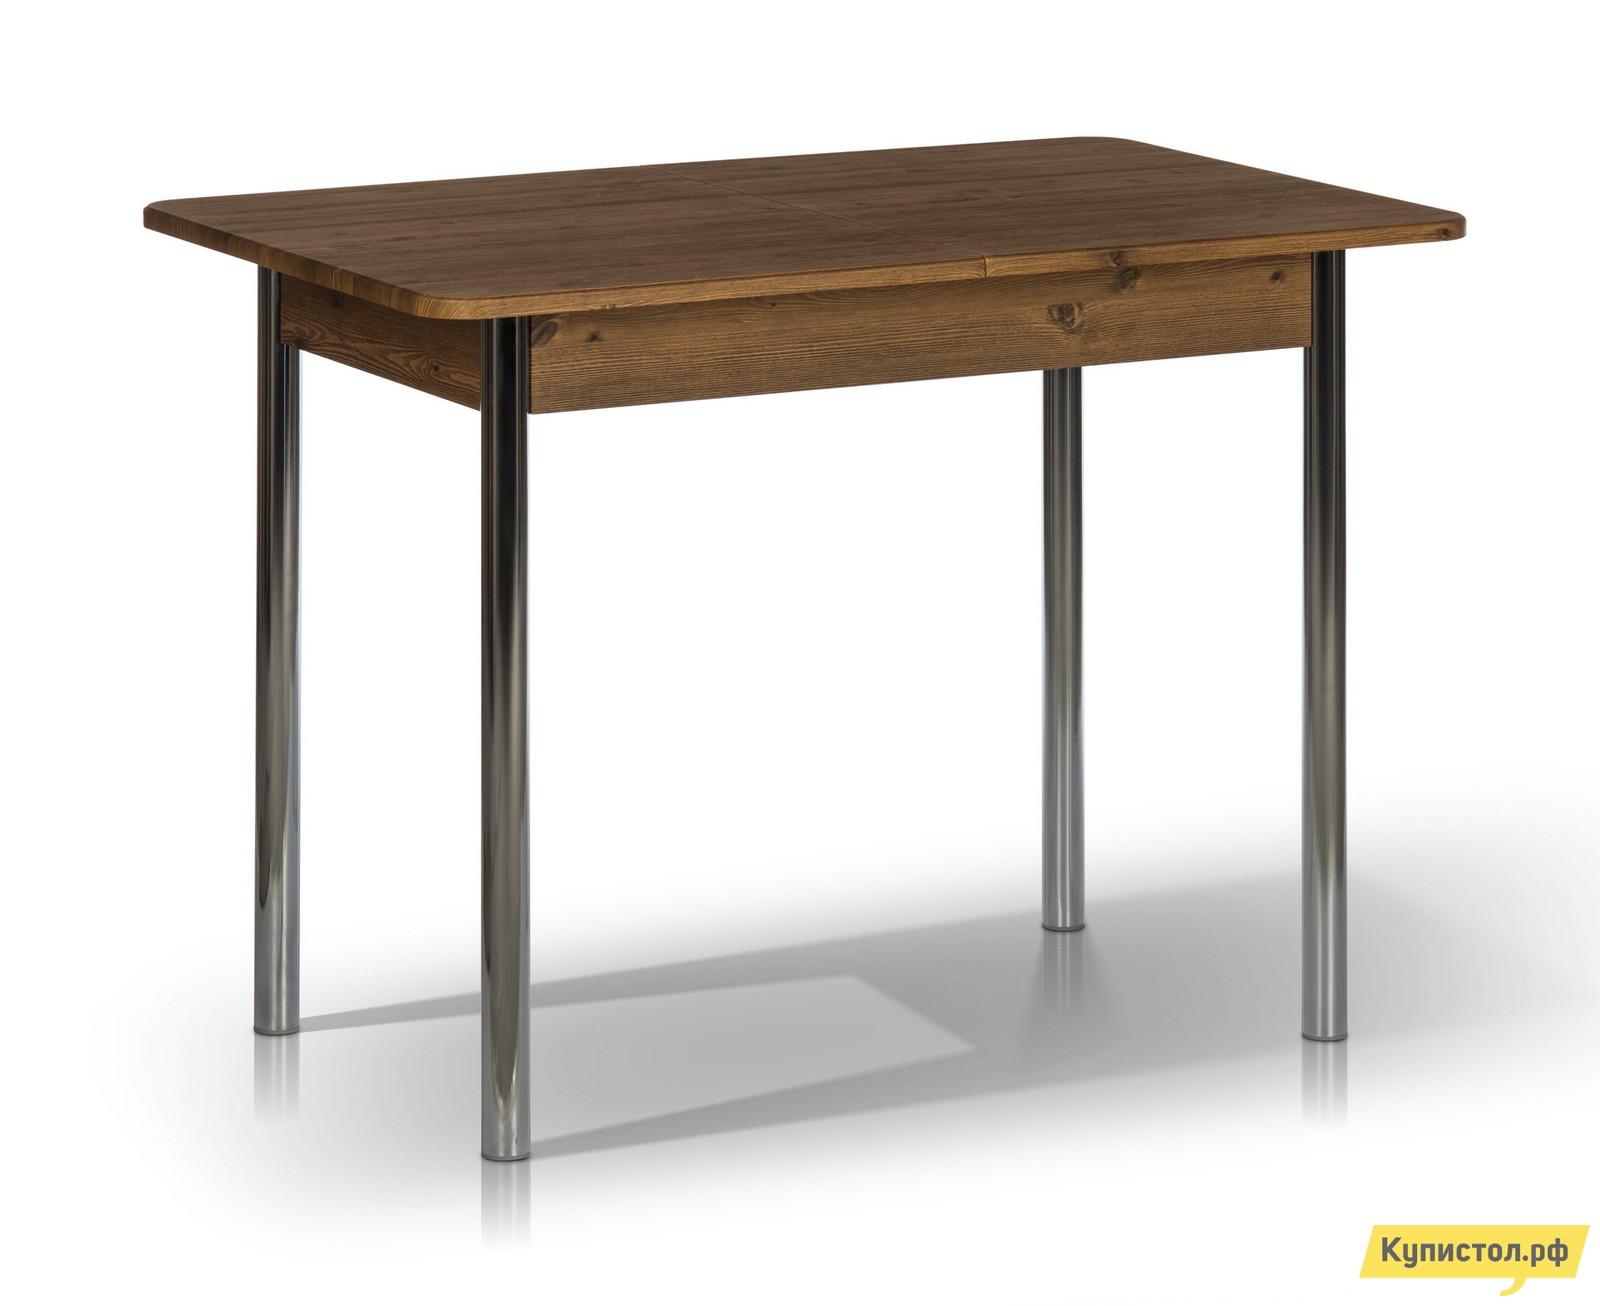 Кухонный стол МегаЭлатон Капри Каштан минск